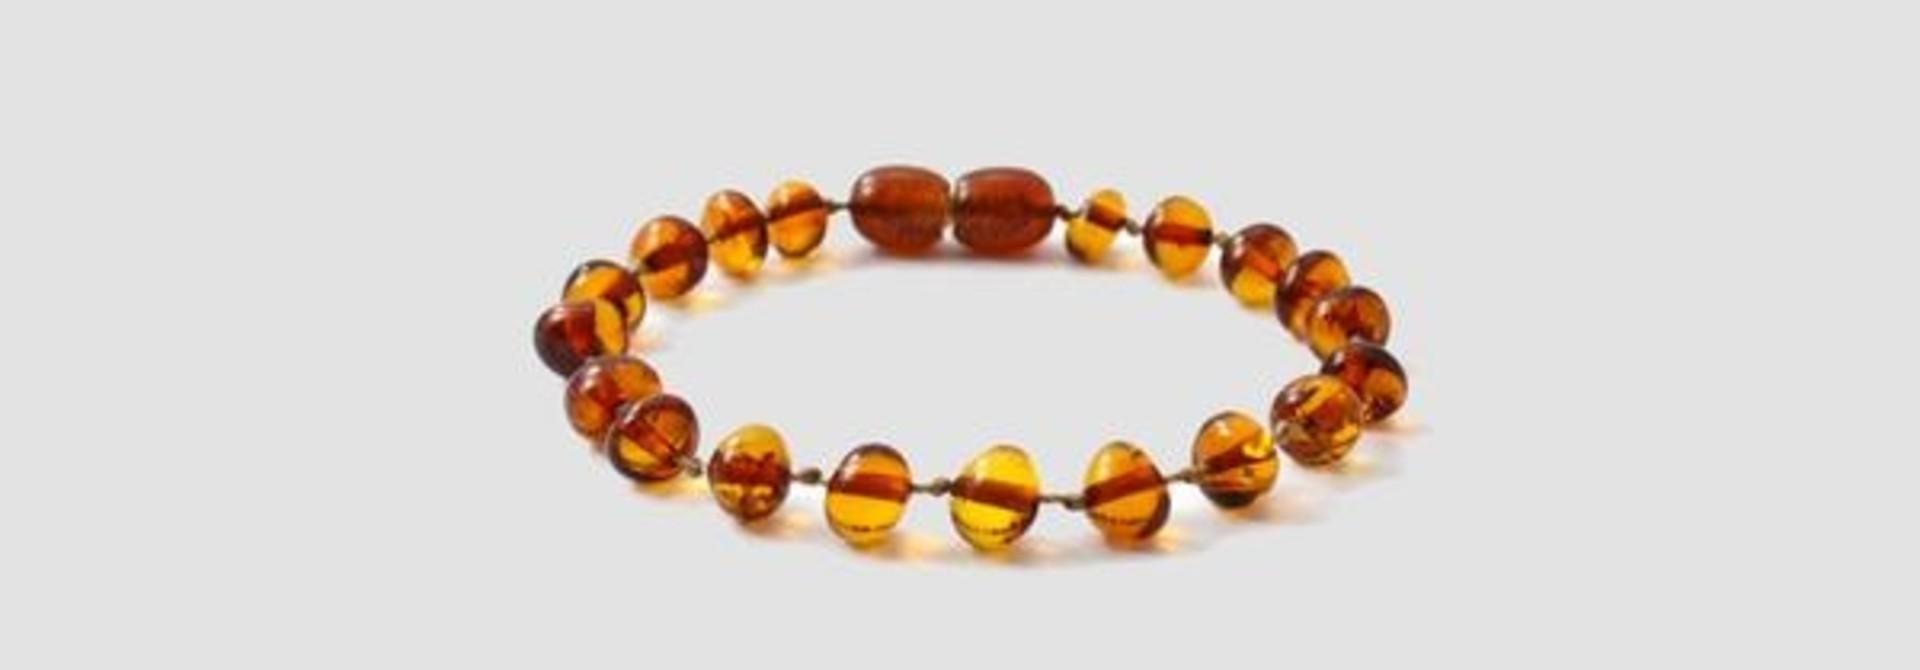 Amber toddler bracelet